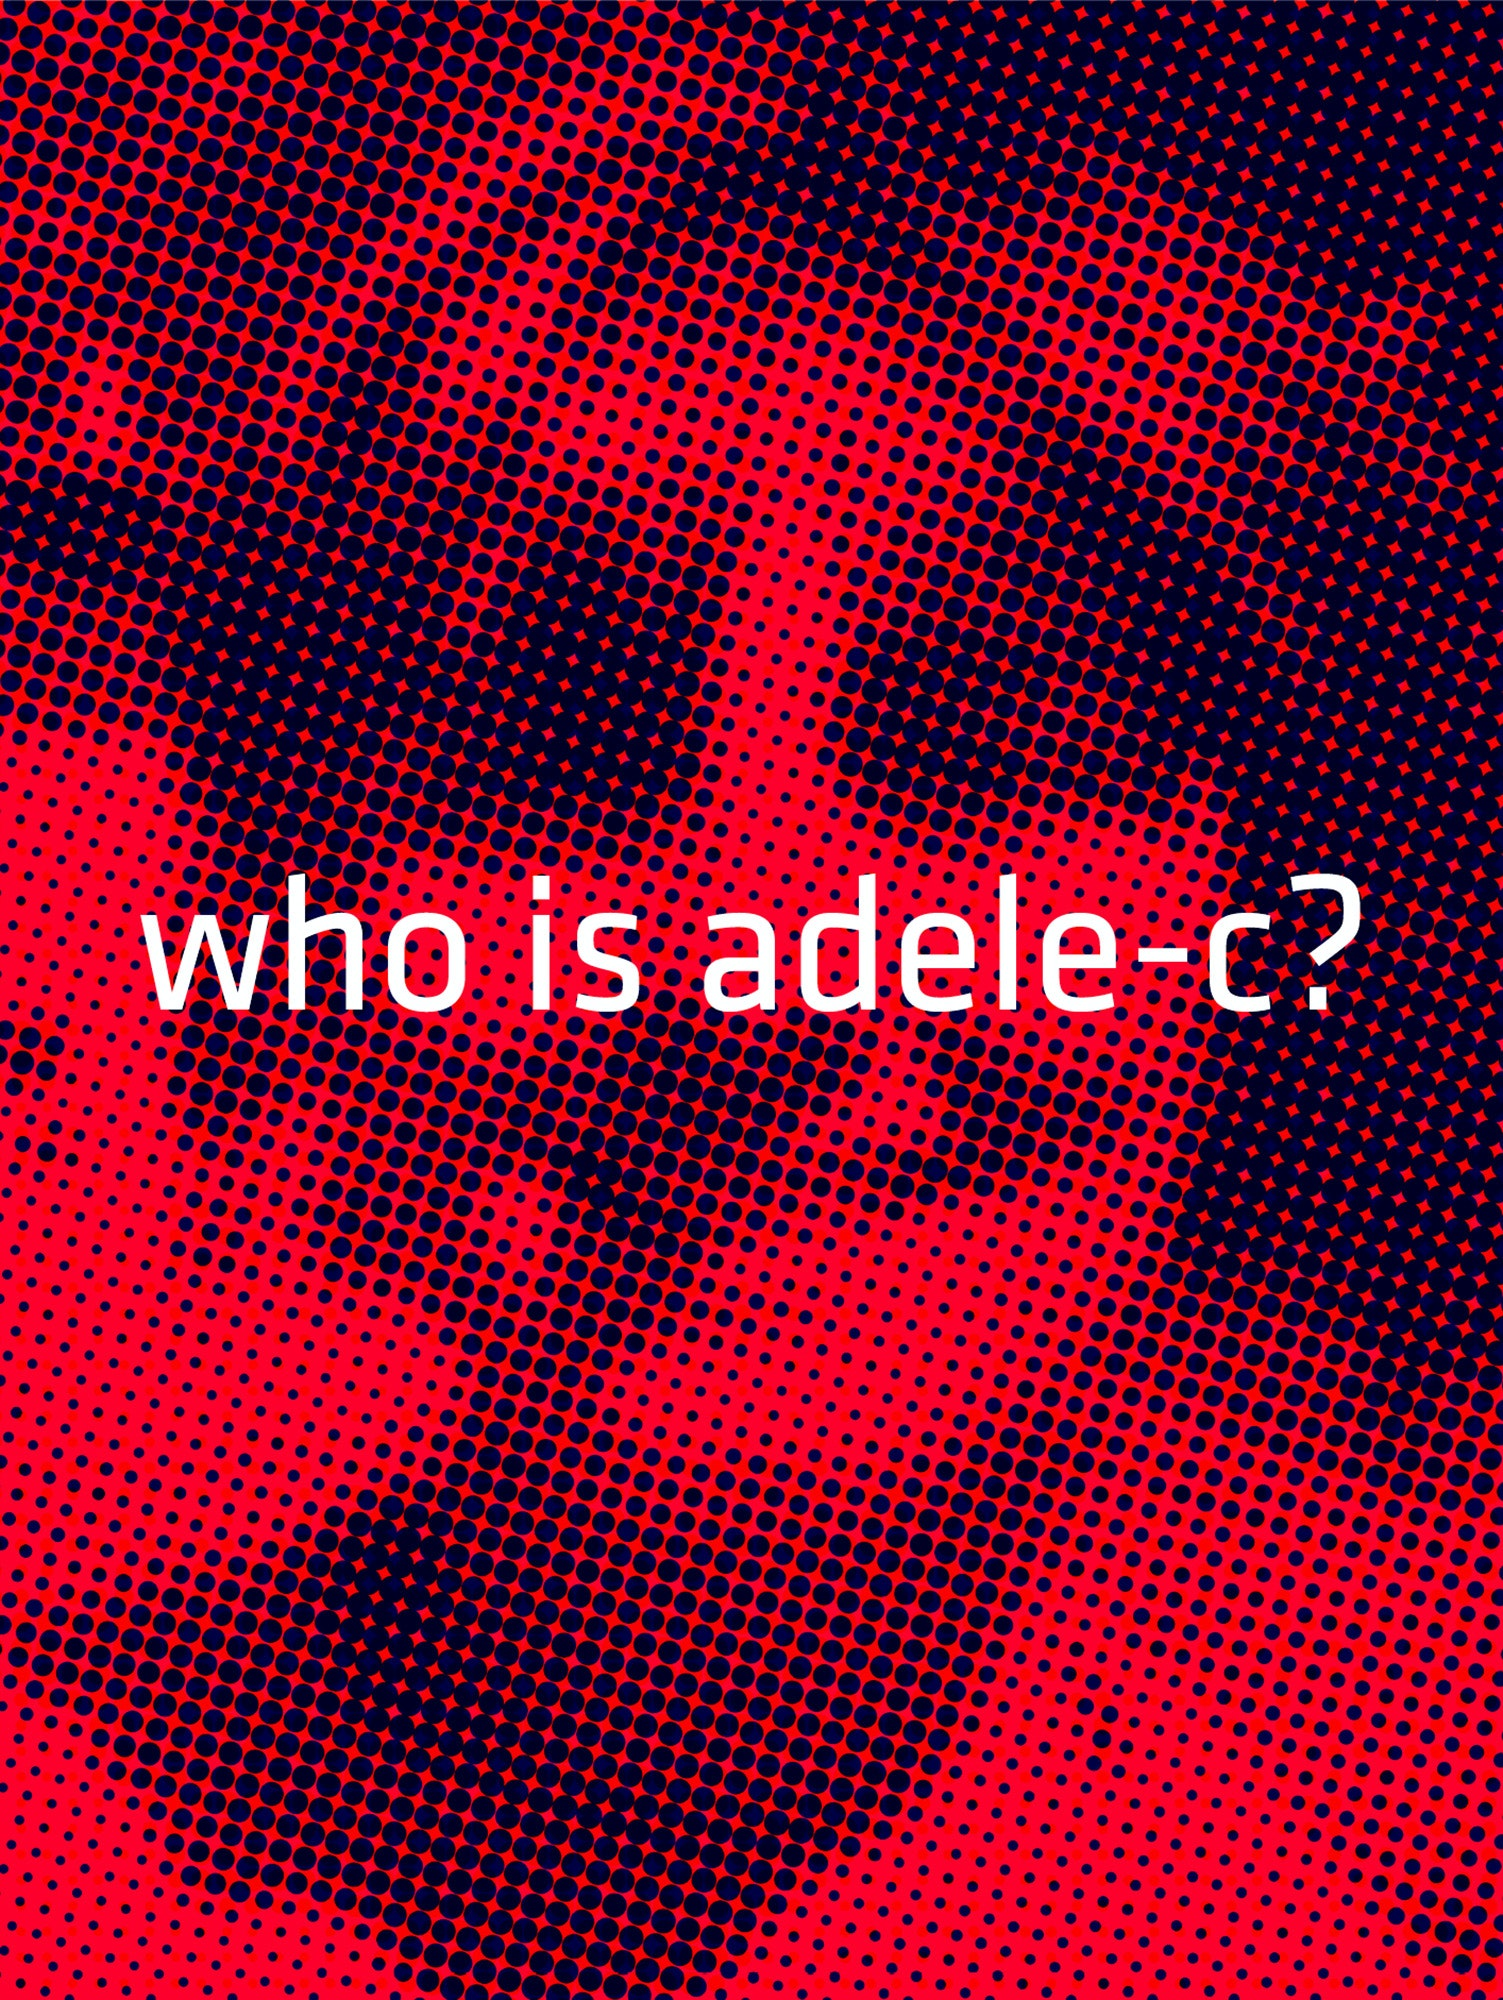 Michael Loos - Postcard-Adele-red